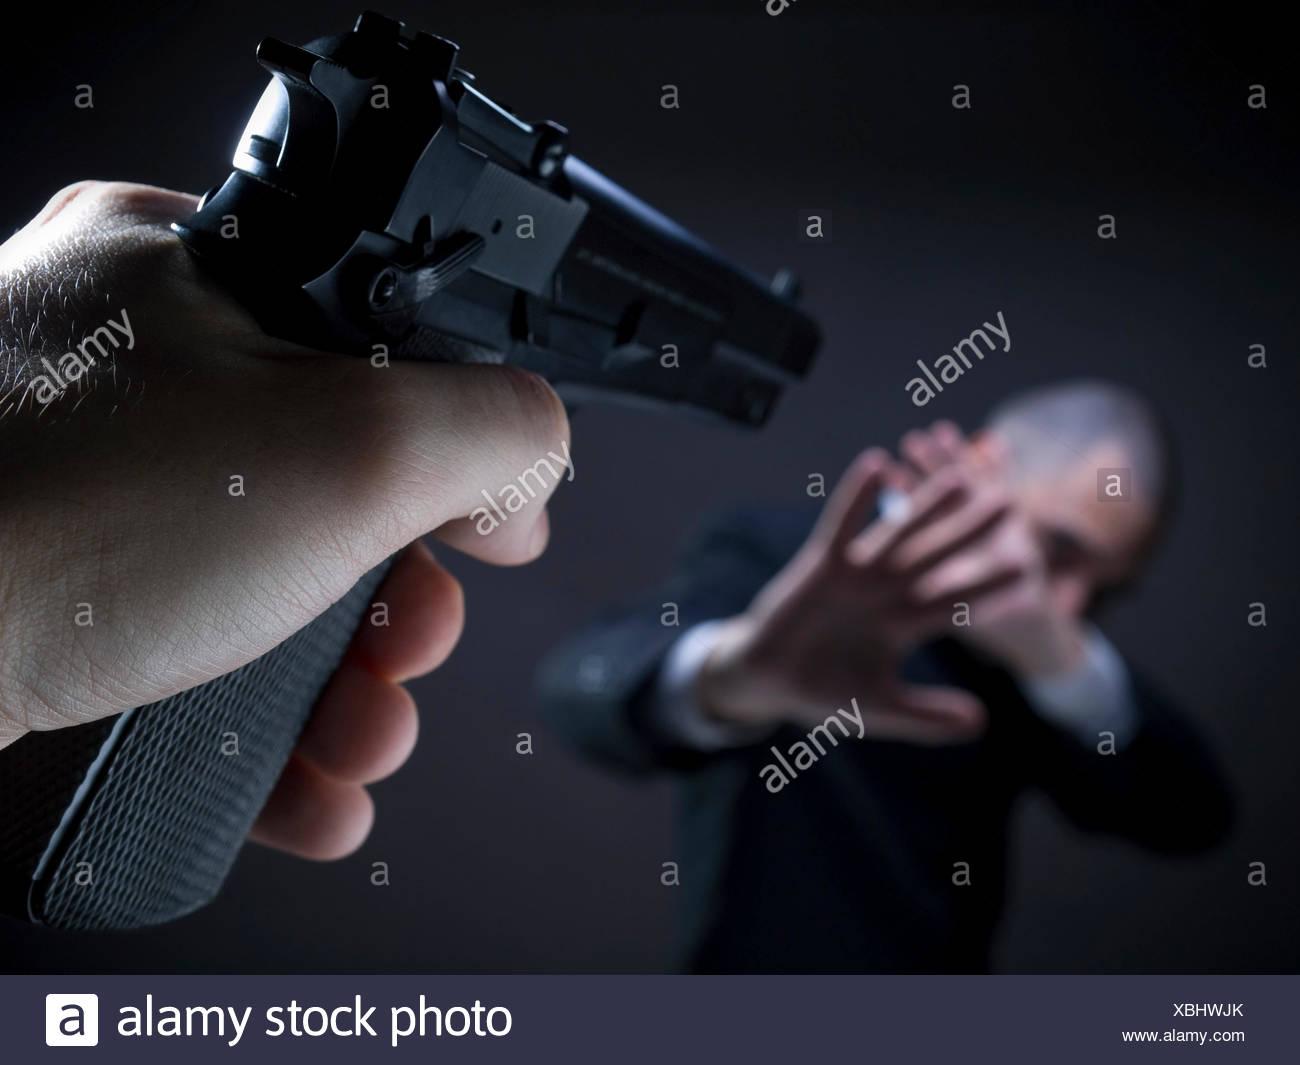 crime victim shot - Stock Image